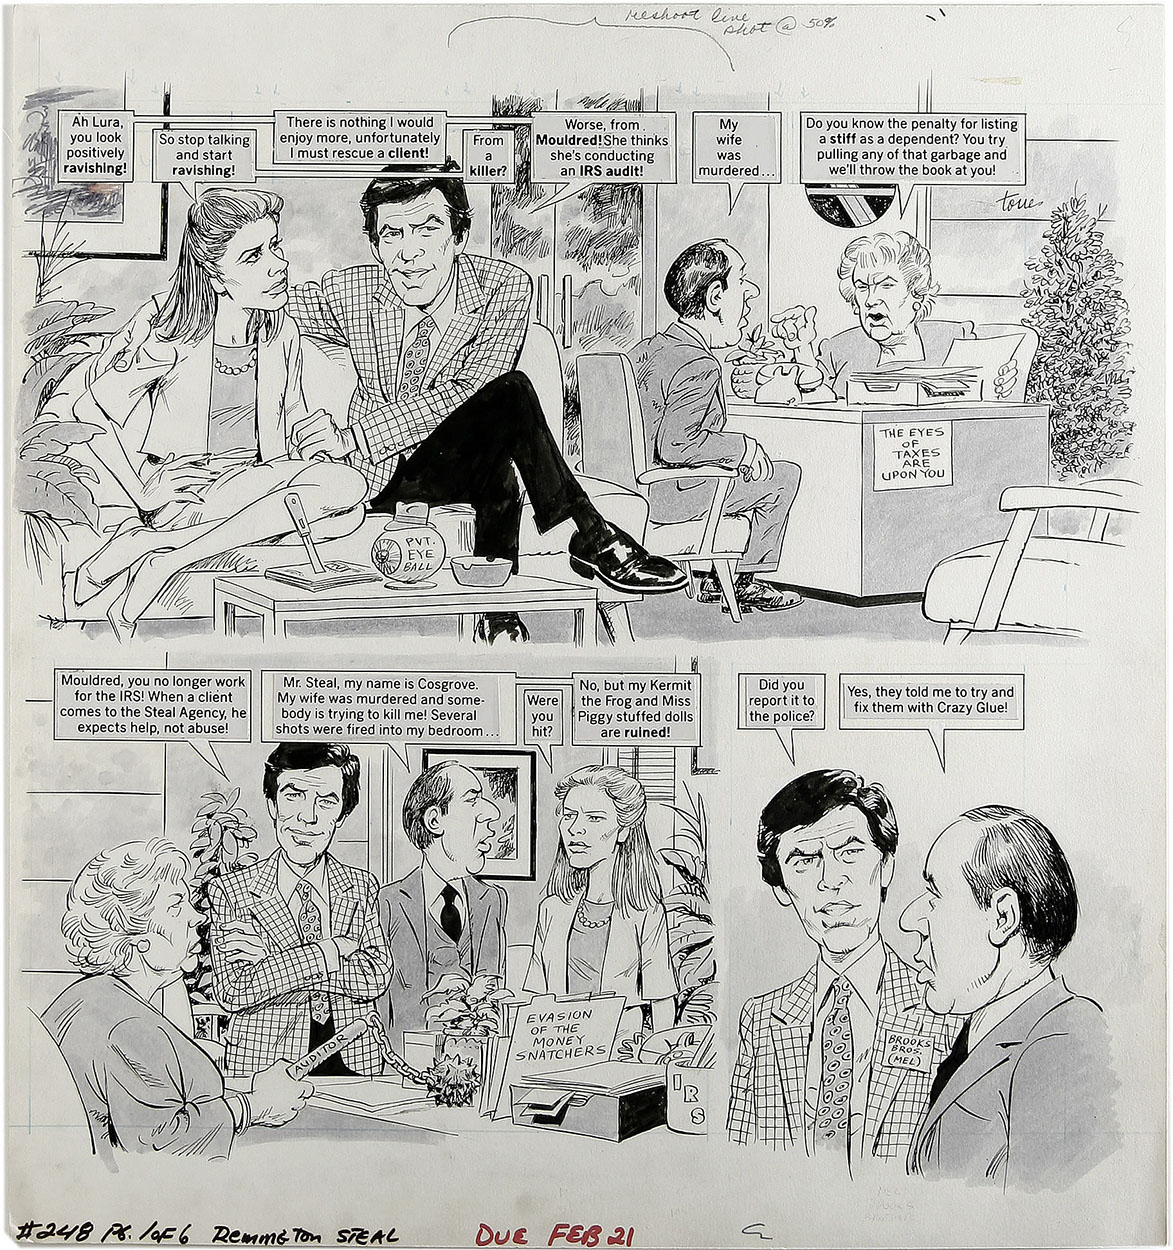 ANGELO TORRES - MAD #248 REMINGTON STEAL 6-PG STORY ORIG ART PIERCE BROSNAN 1984